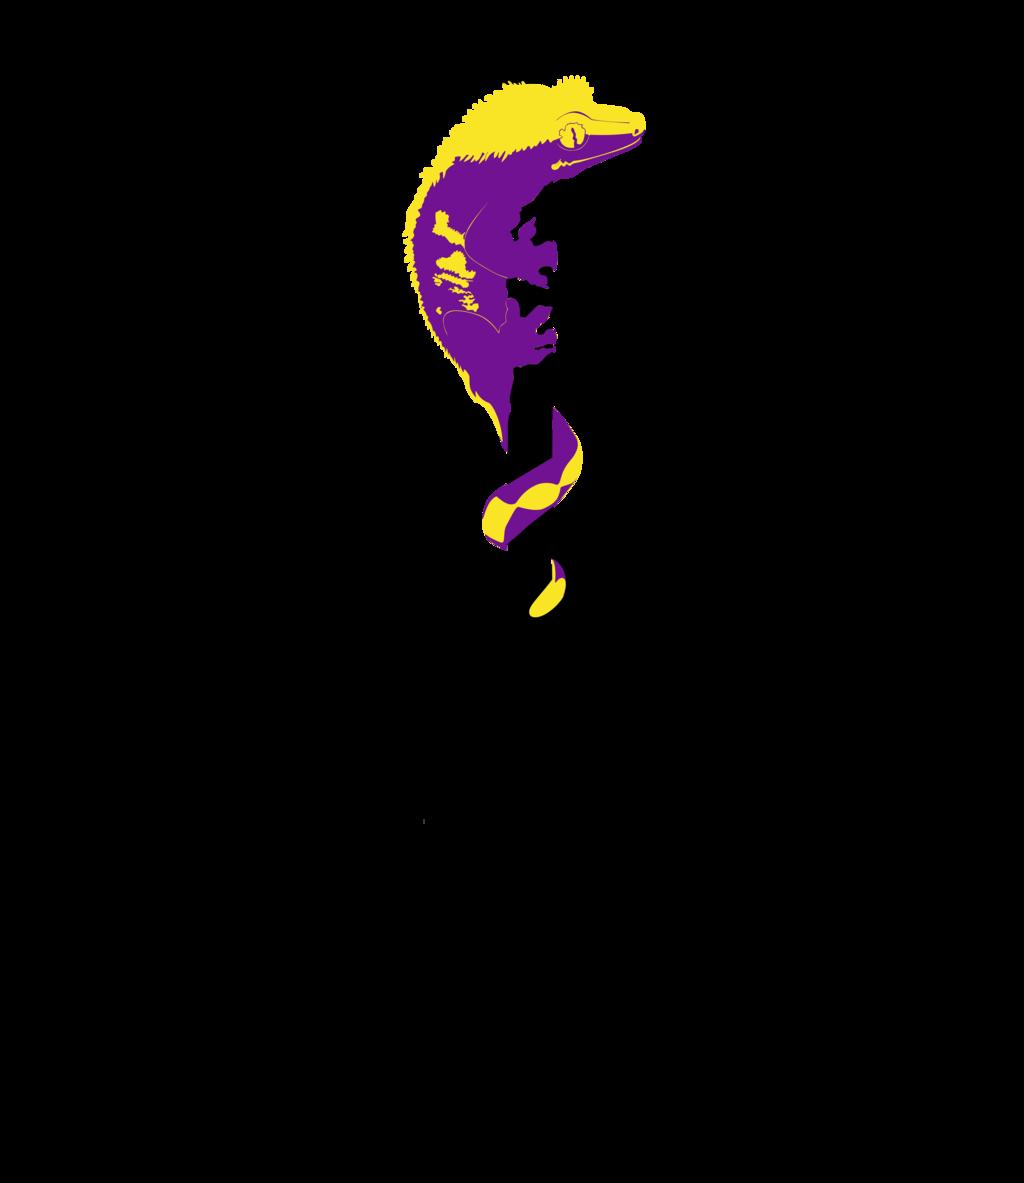 Vector Logo - The Crested Carousel